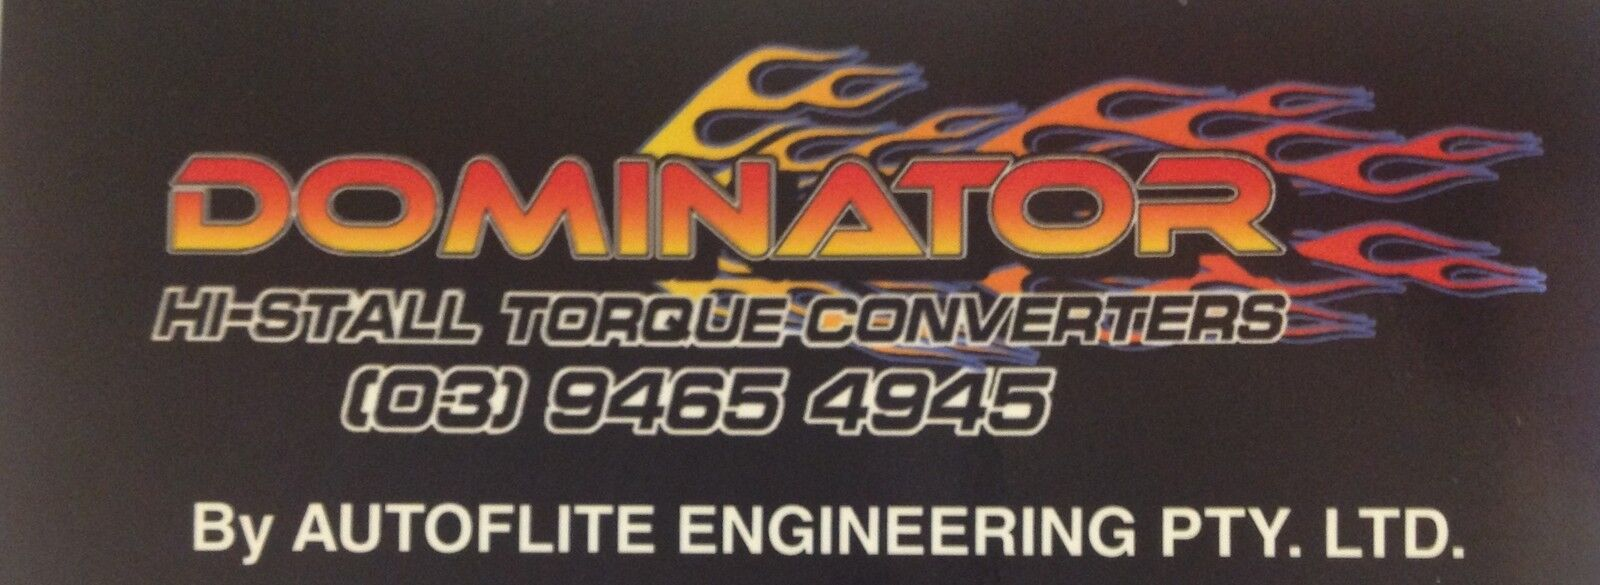 Parts AutoFlite Engineering